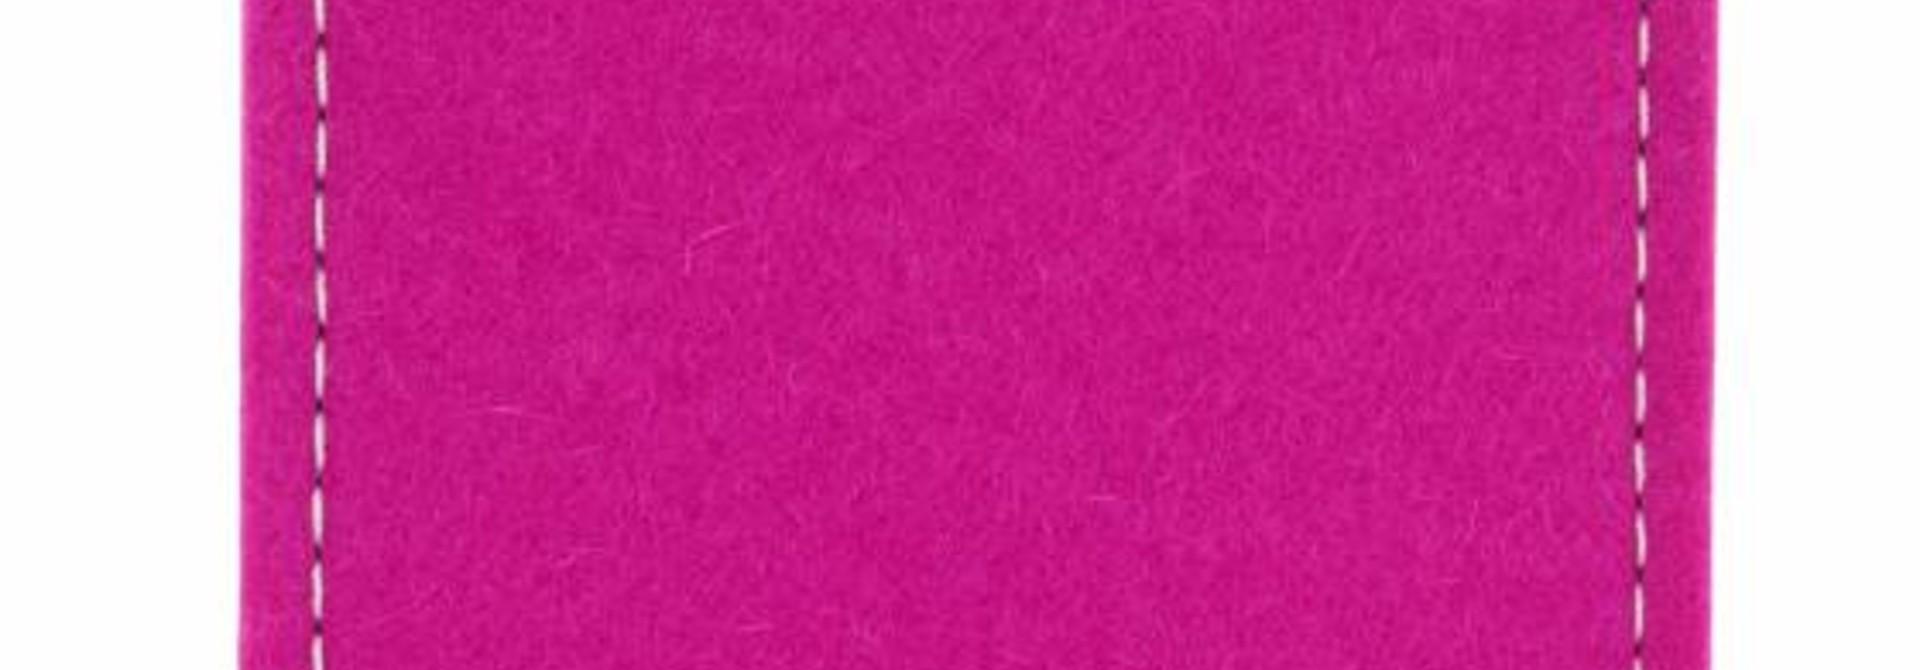 Mi / Redmi Sleeve Pink